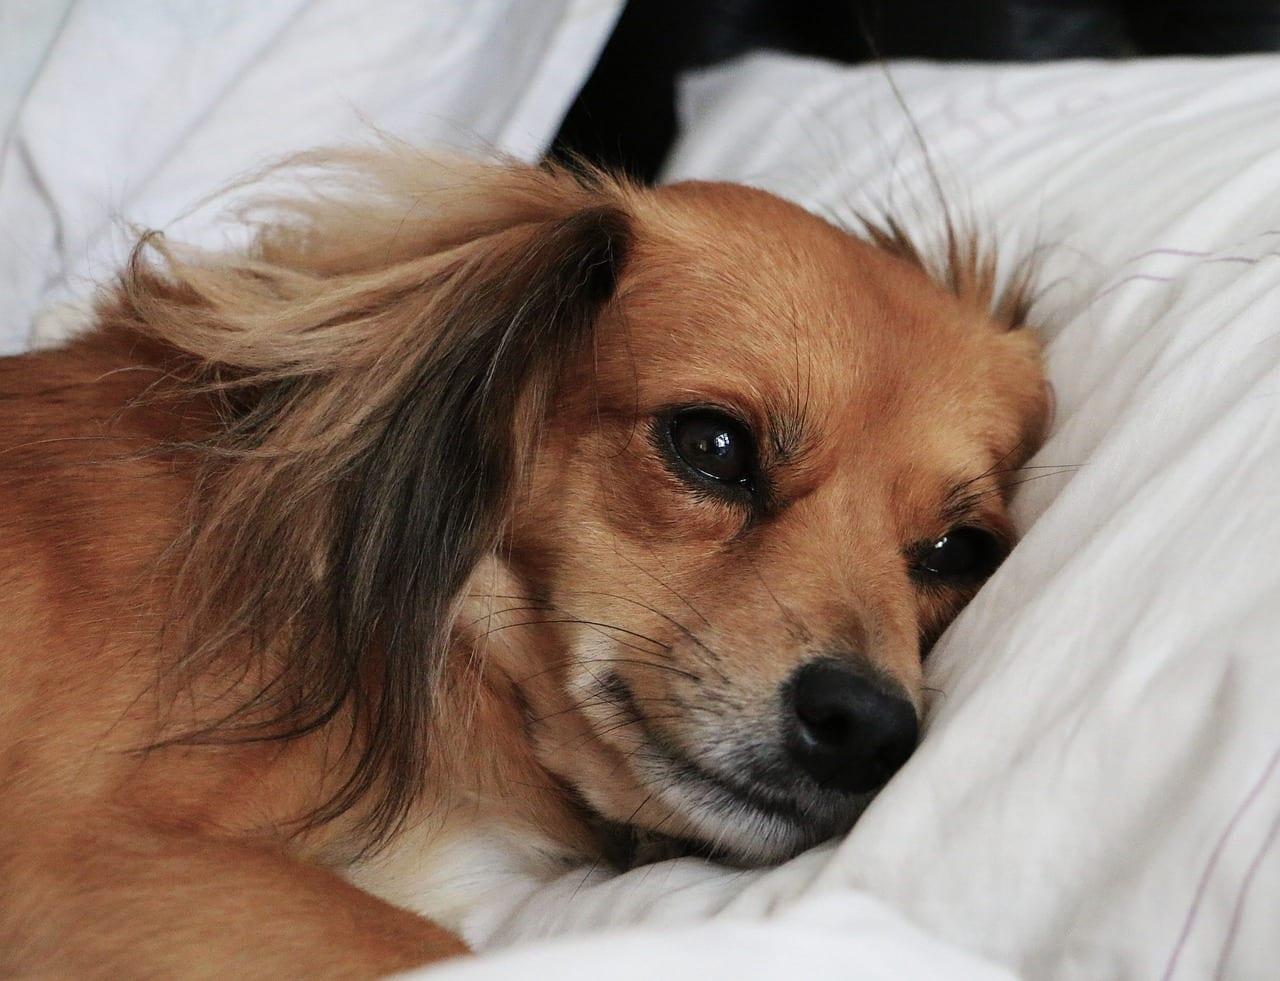 Perro triste en la cama